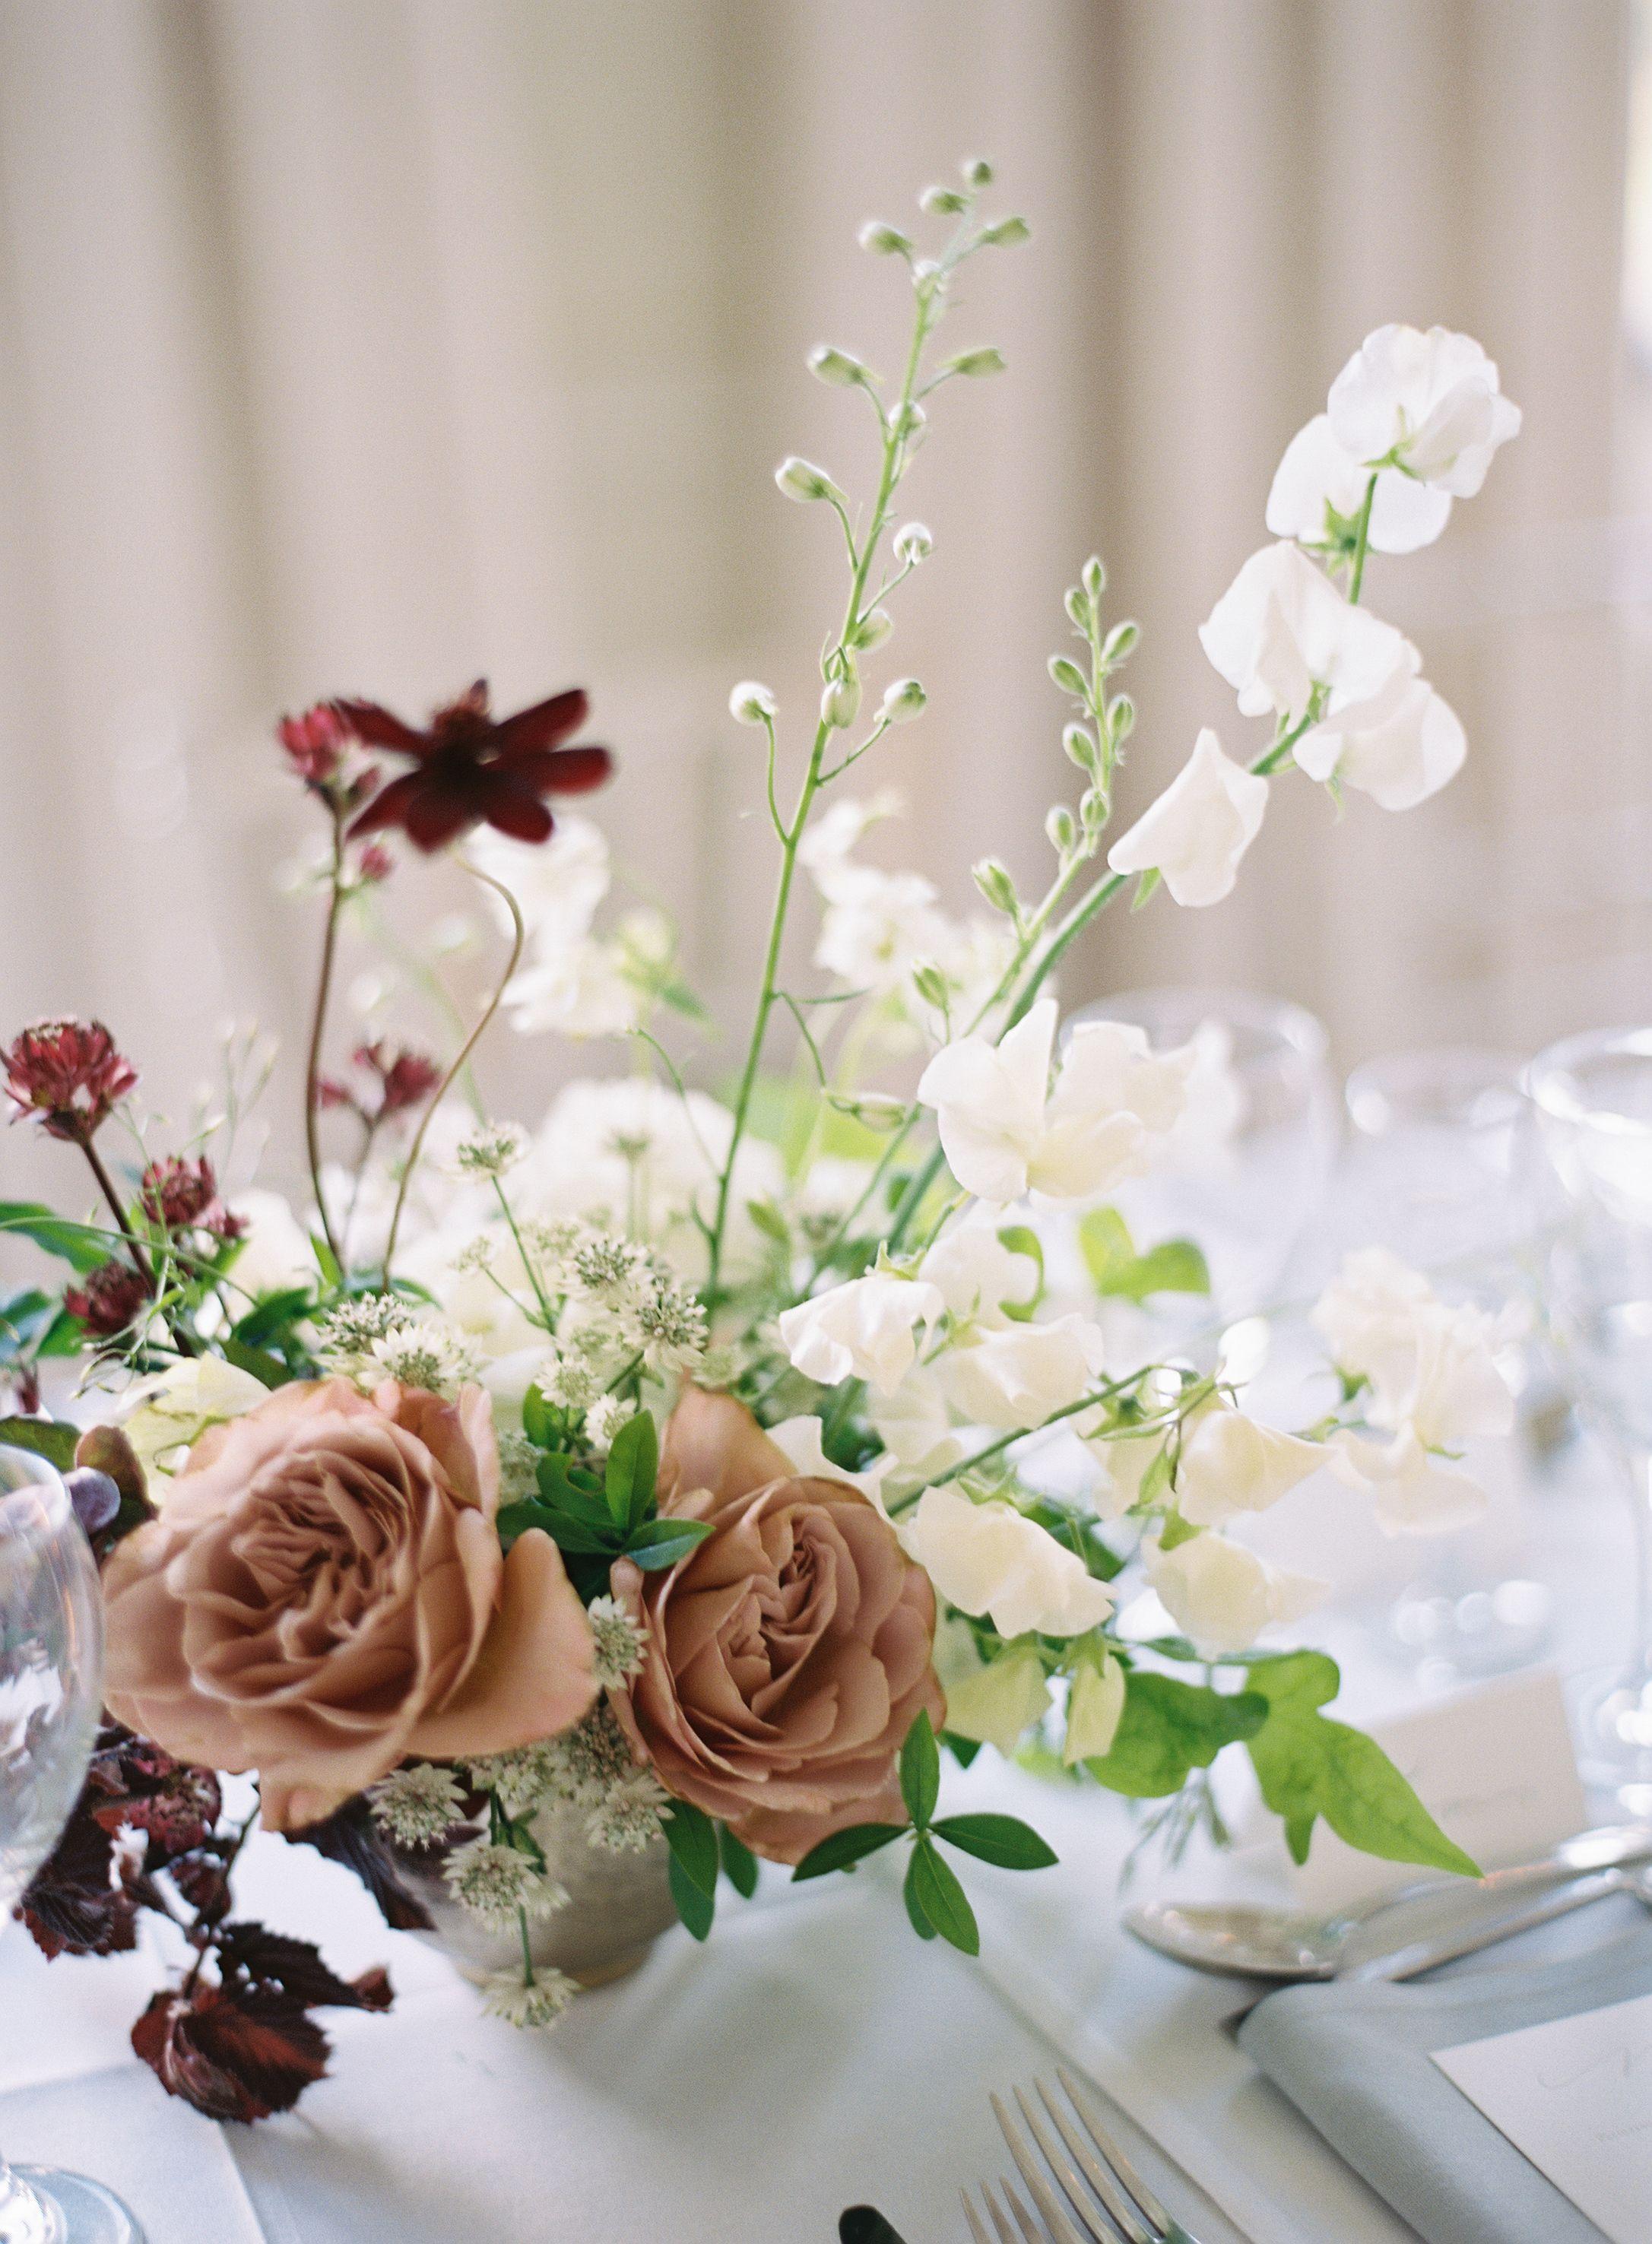 English wedding decoration ideas  An English Estate Wedding Anchored In Minimalist Design  Flowers